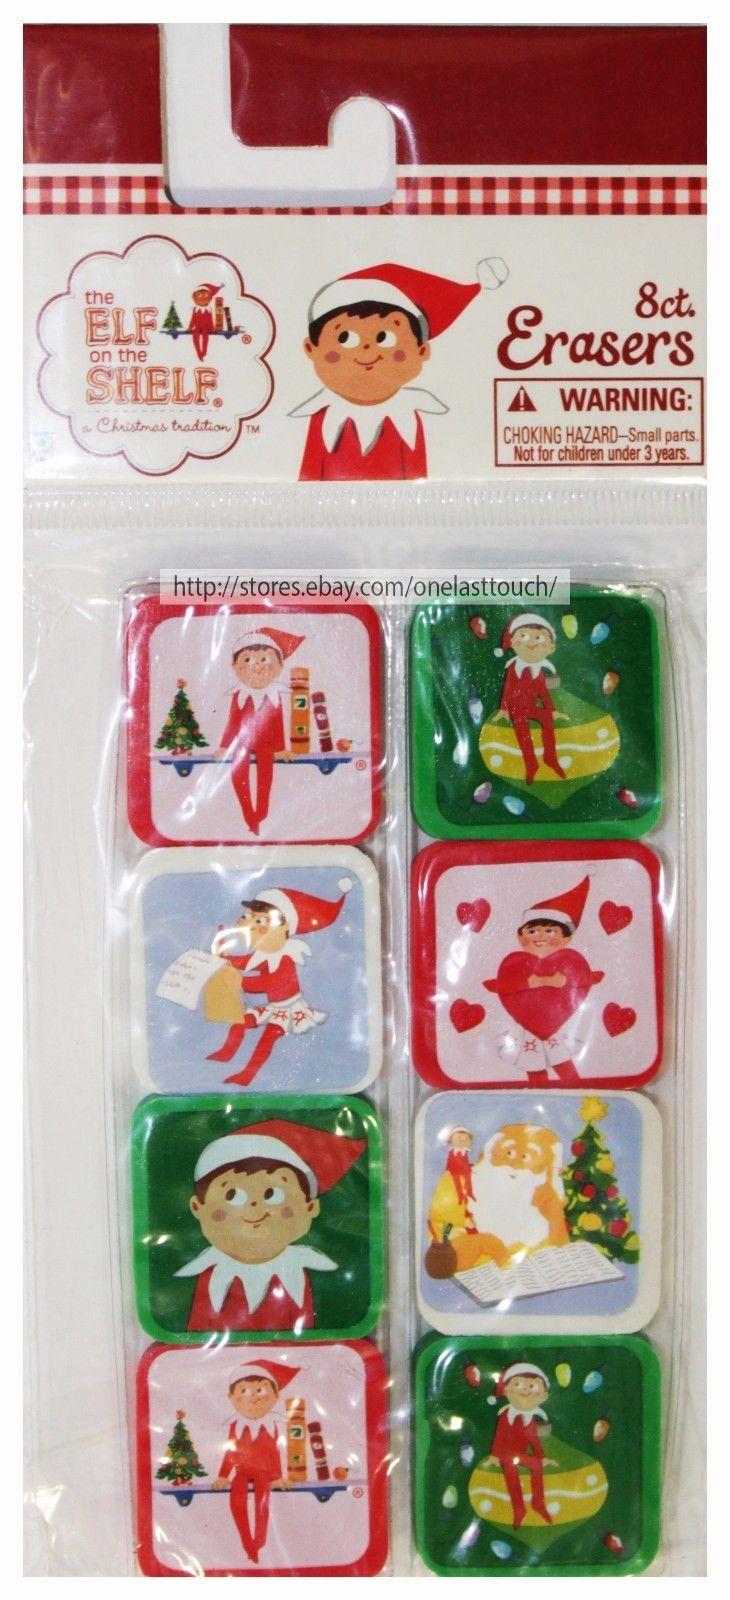 RAYMOND GEDDES*(1)8pc Set CHRISTMAS/HOLIDAY ERASERS Designs May Vary YOU CHOOSE*